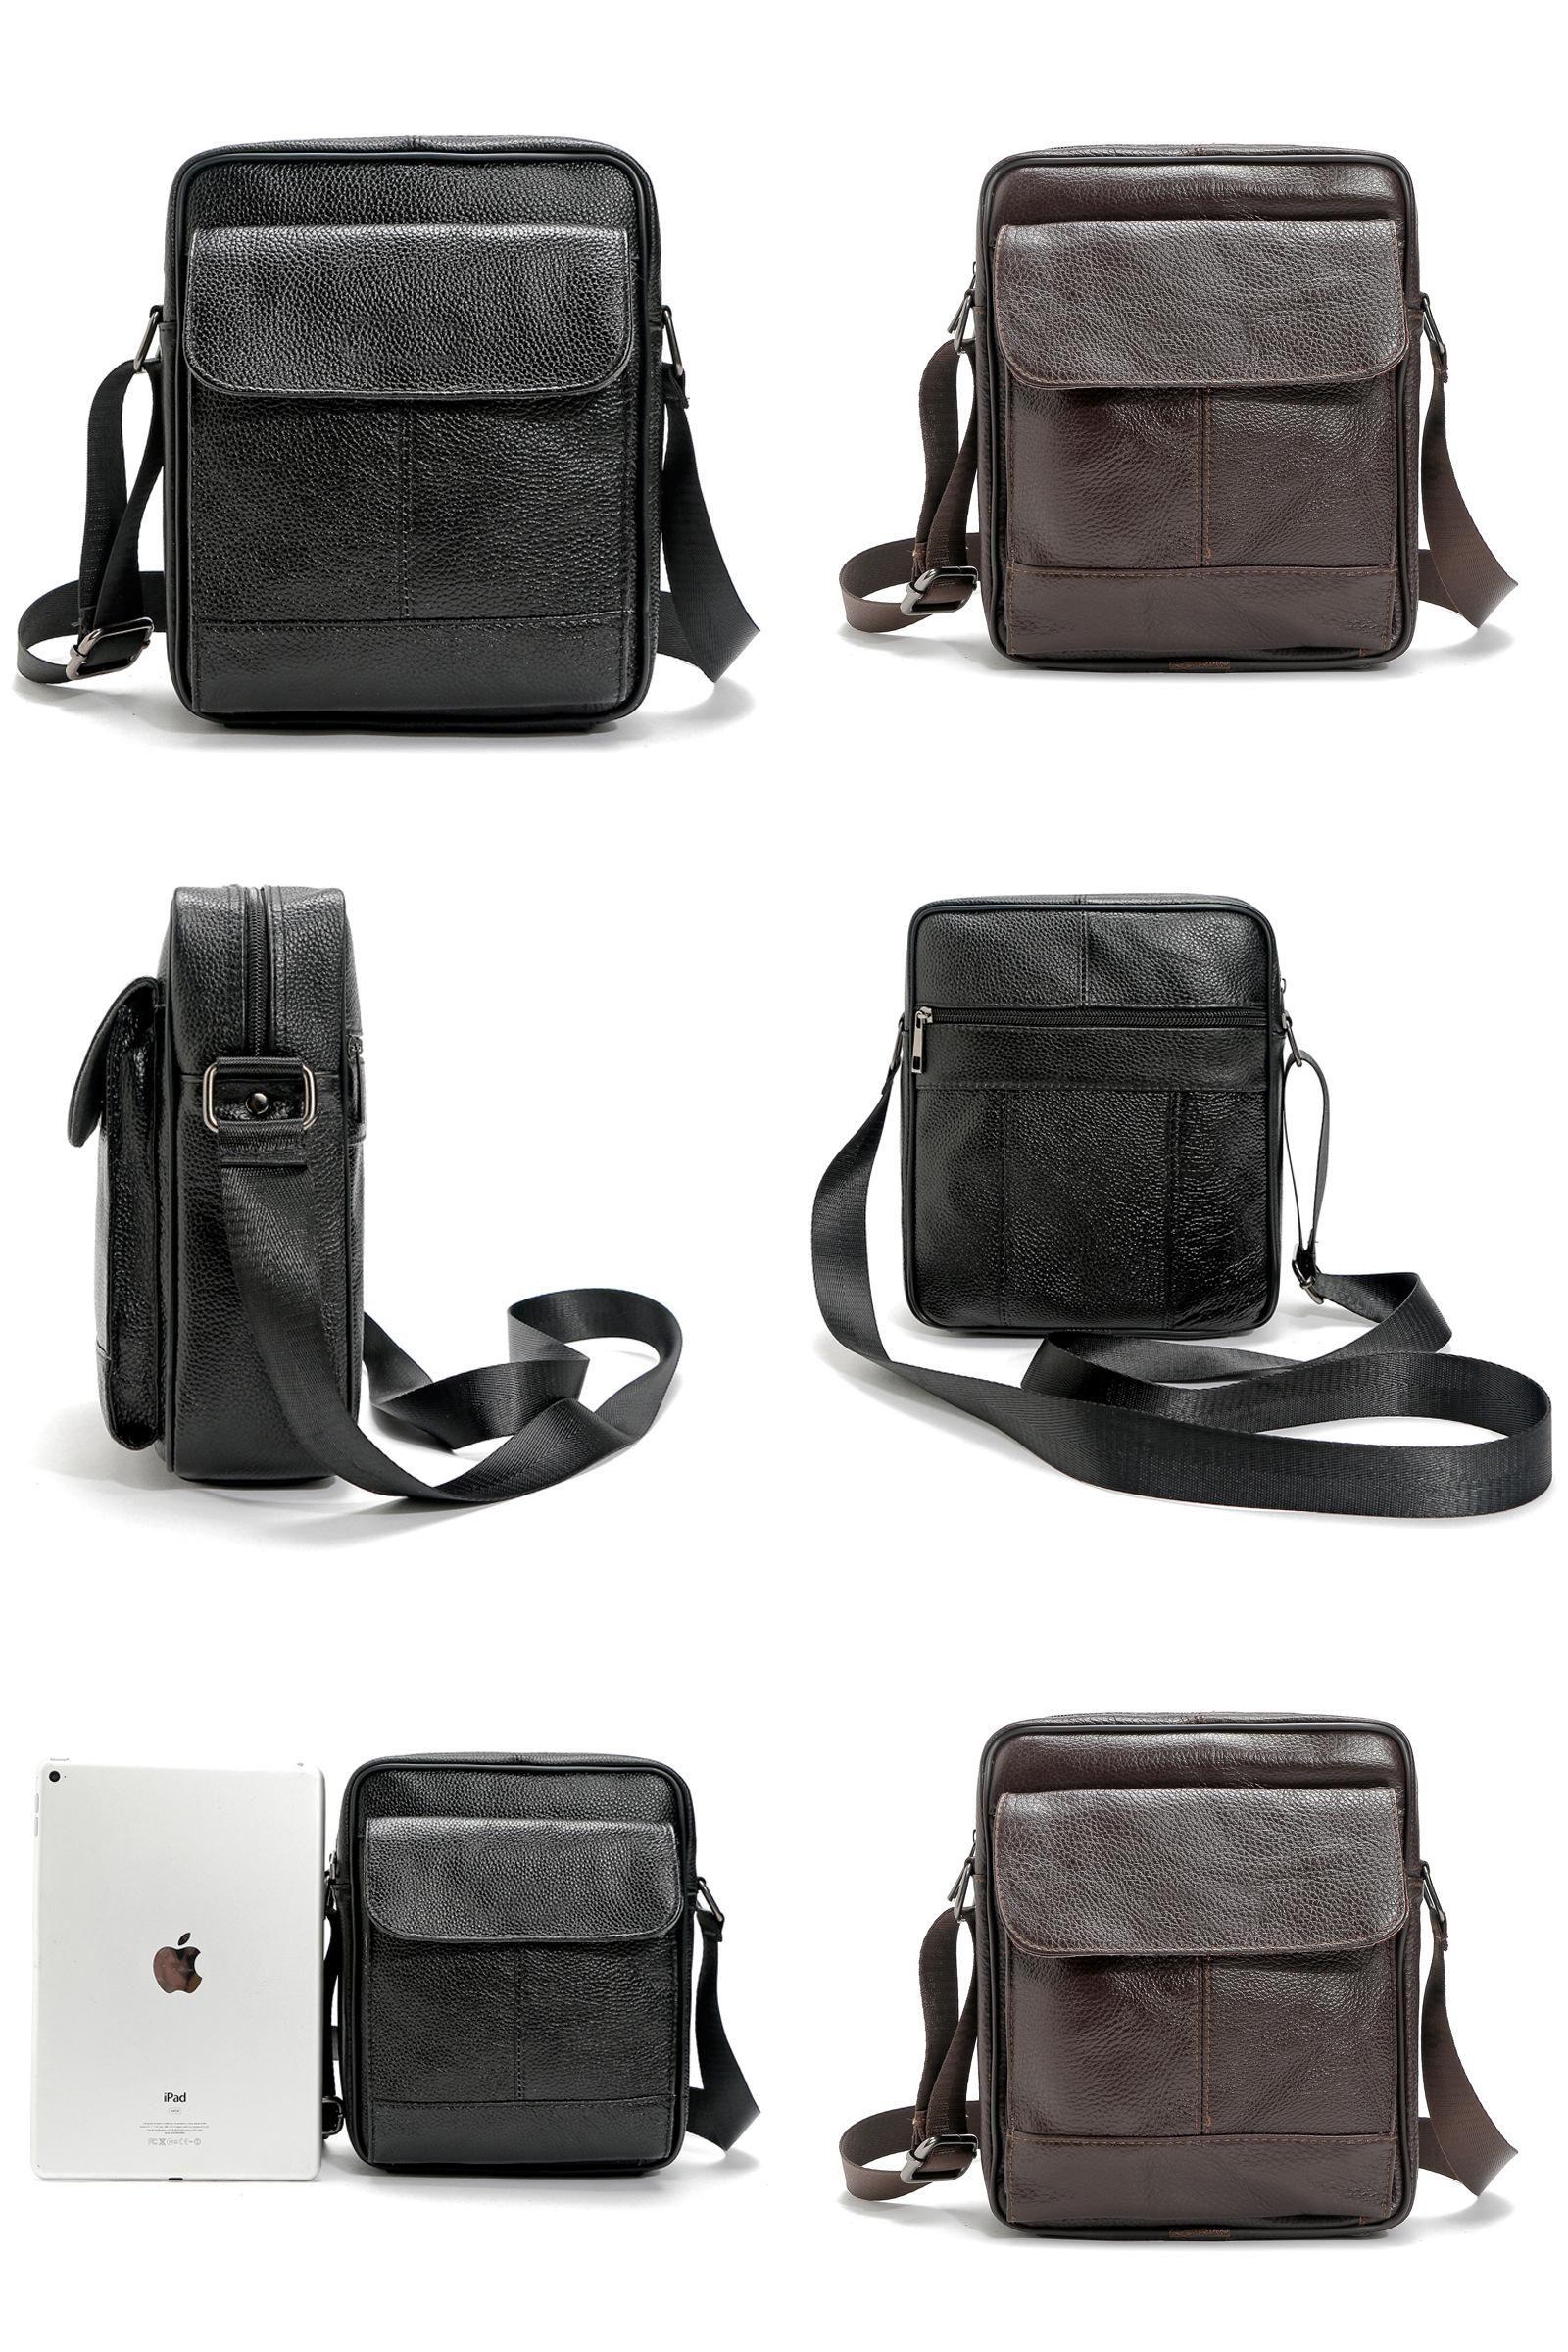 b1ad219f7fe6 [Visit to Buy] Genuine Leather Men Bags Hot Sale ipad Handbags Male  Messenger Bag Man Crossbody Shoulder Bag Men's Travel Bags #Advertisement